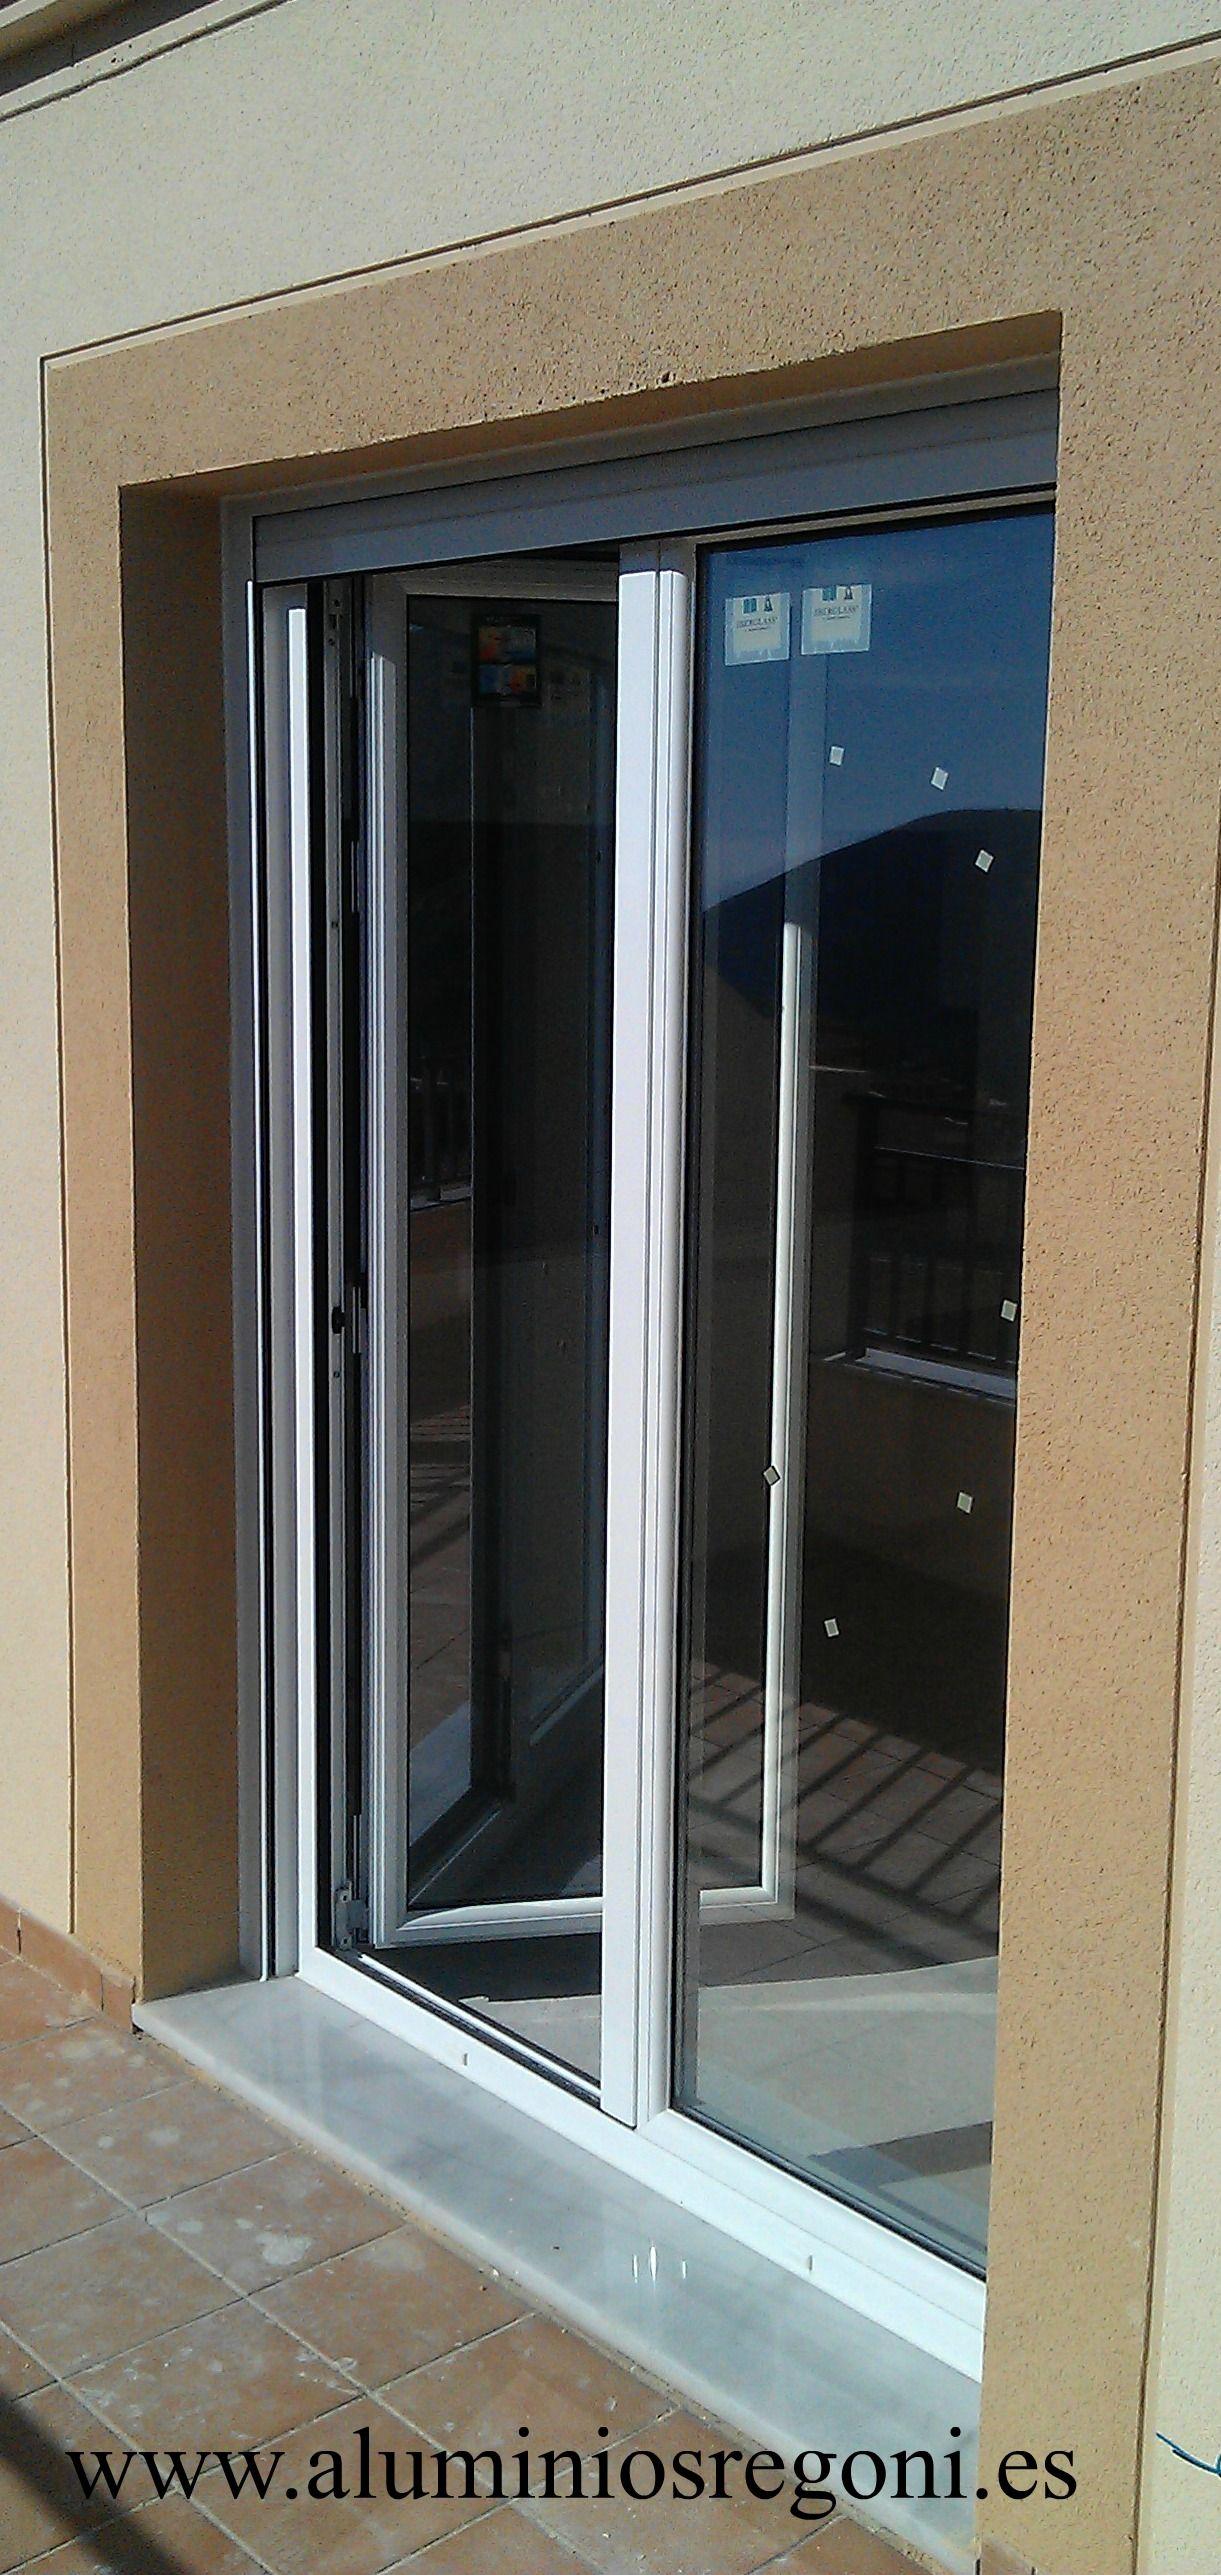 Ventana de aluminio con rotura de puente termico for Puerta ventana corrediza aluminio